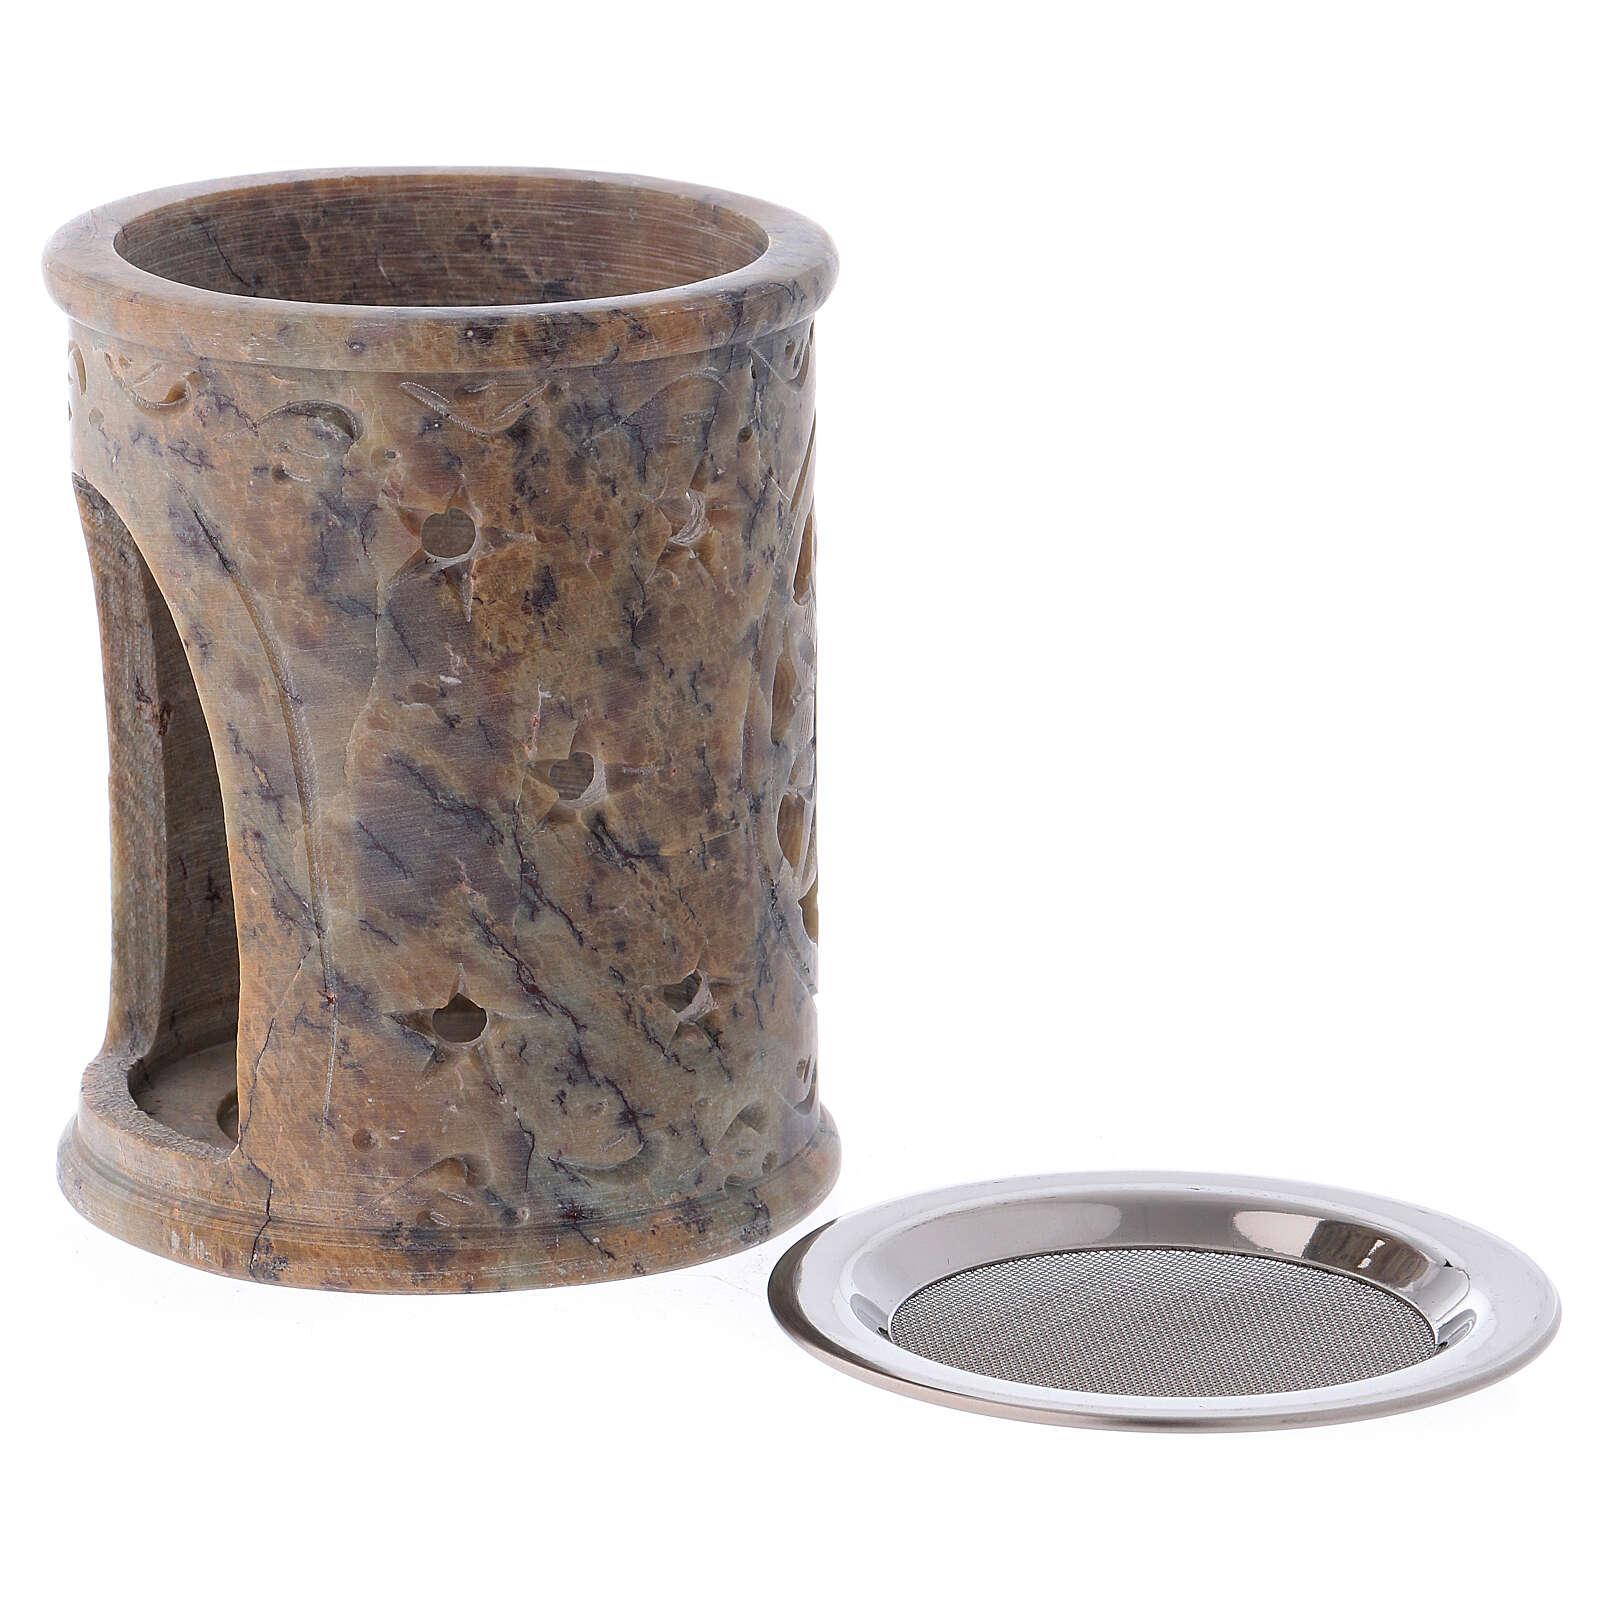 Incense burner in sand colored marbled soapstone 3